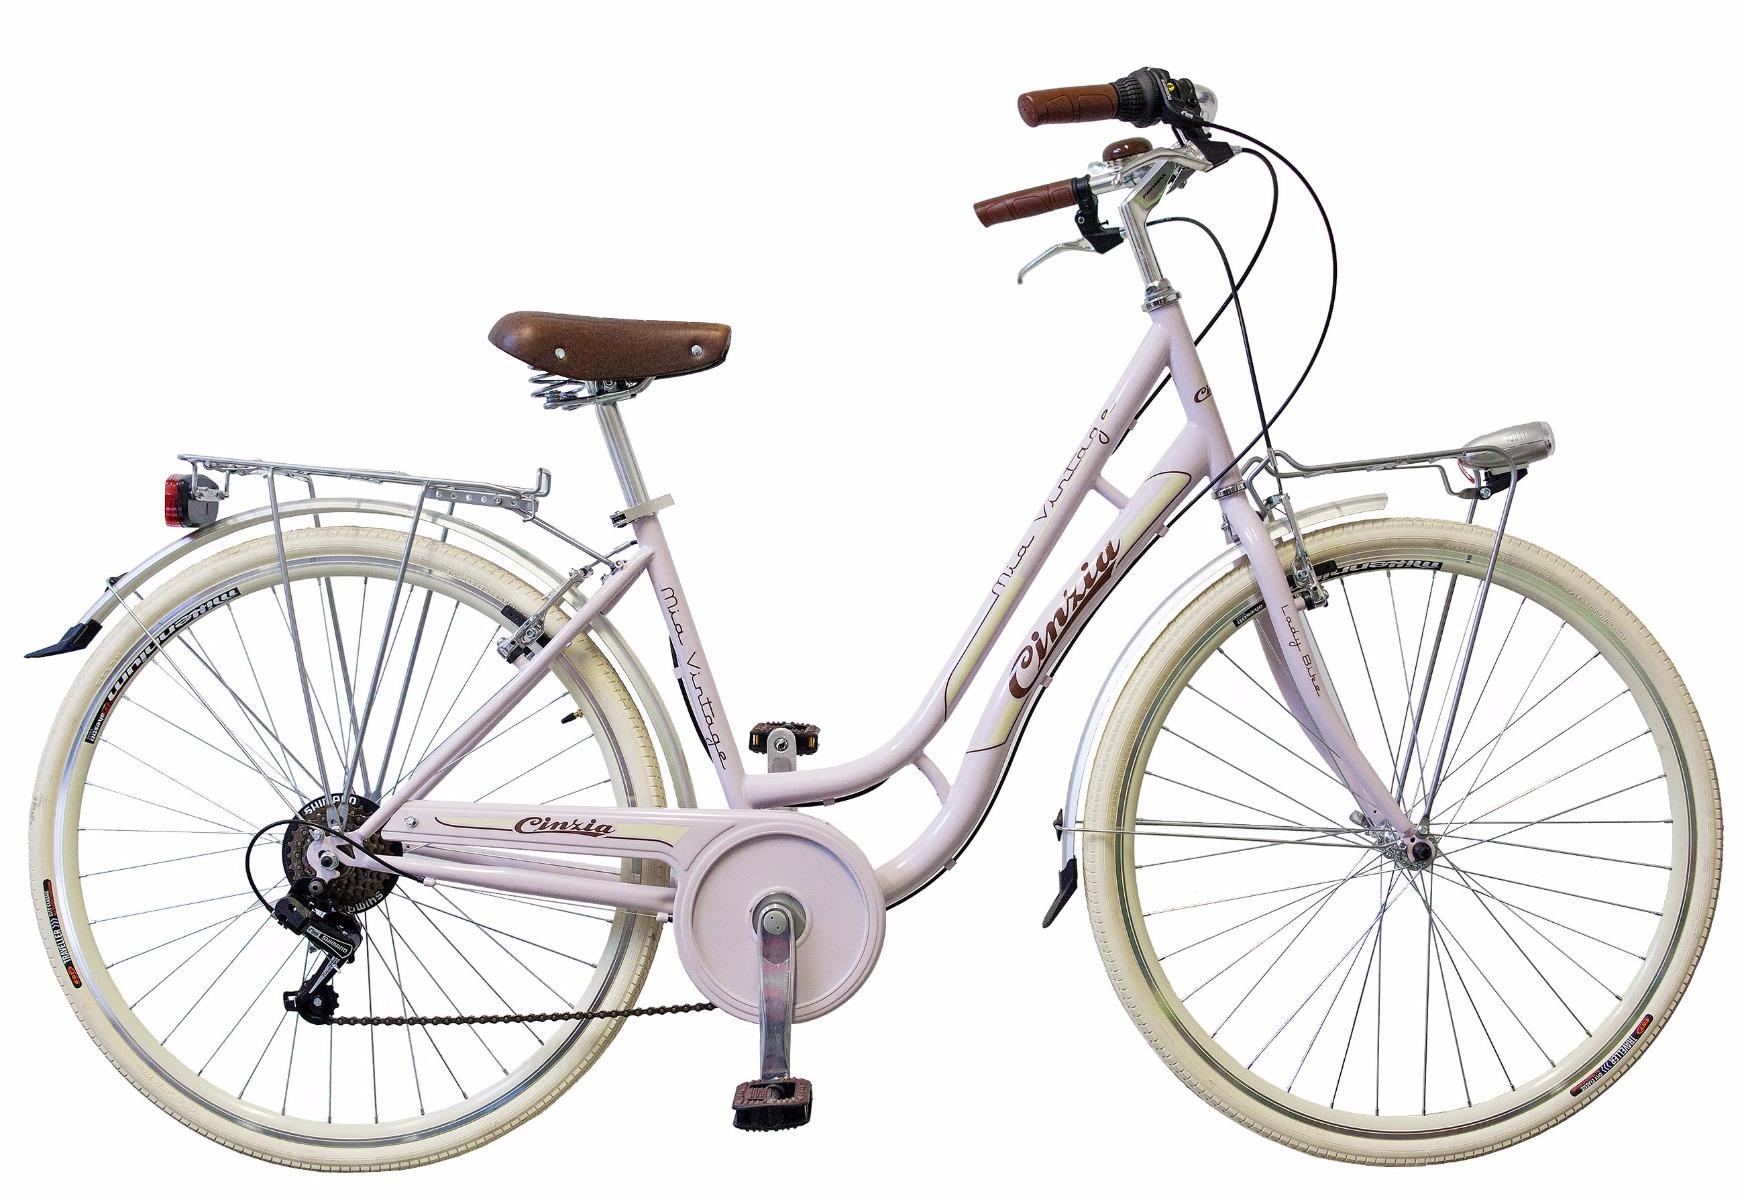 Noleggio bici a Roma